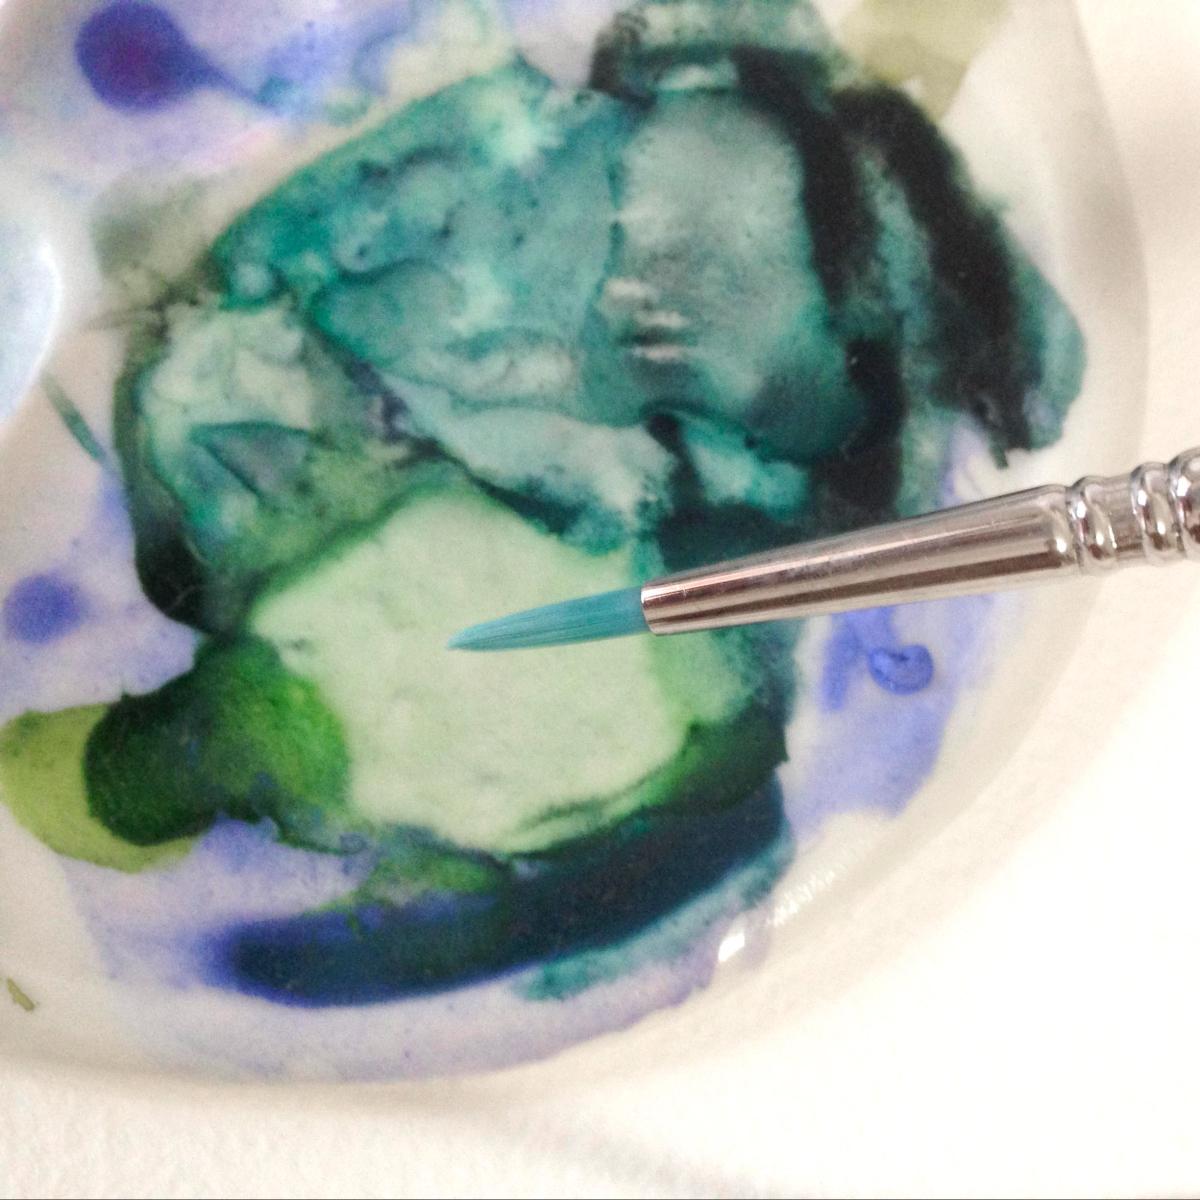 沉澱色水彩顏料 Granulating watercolor